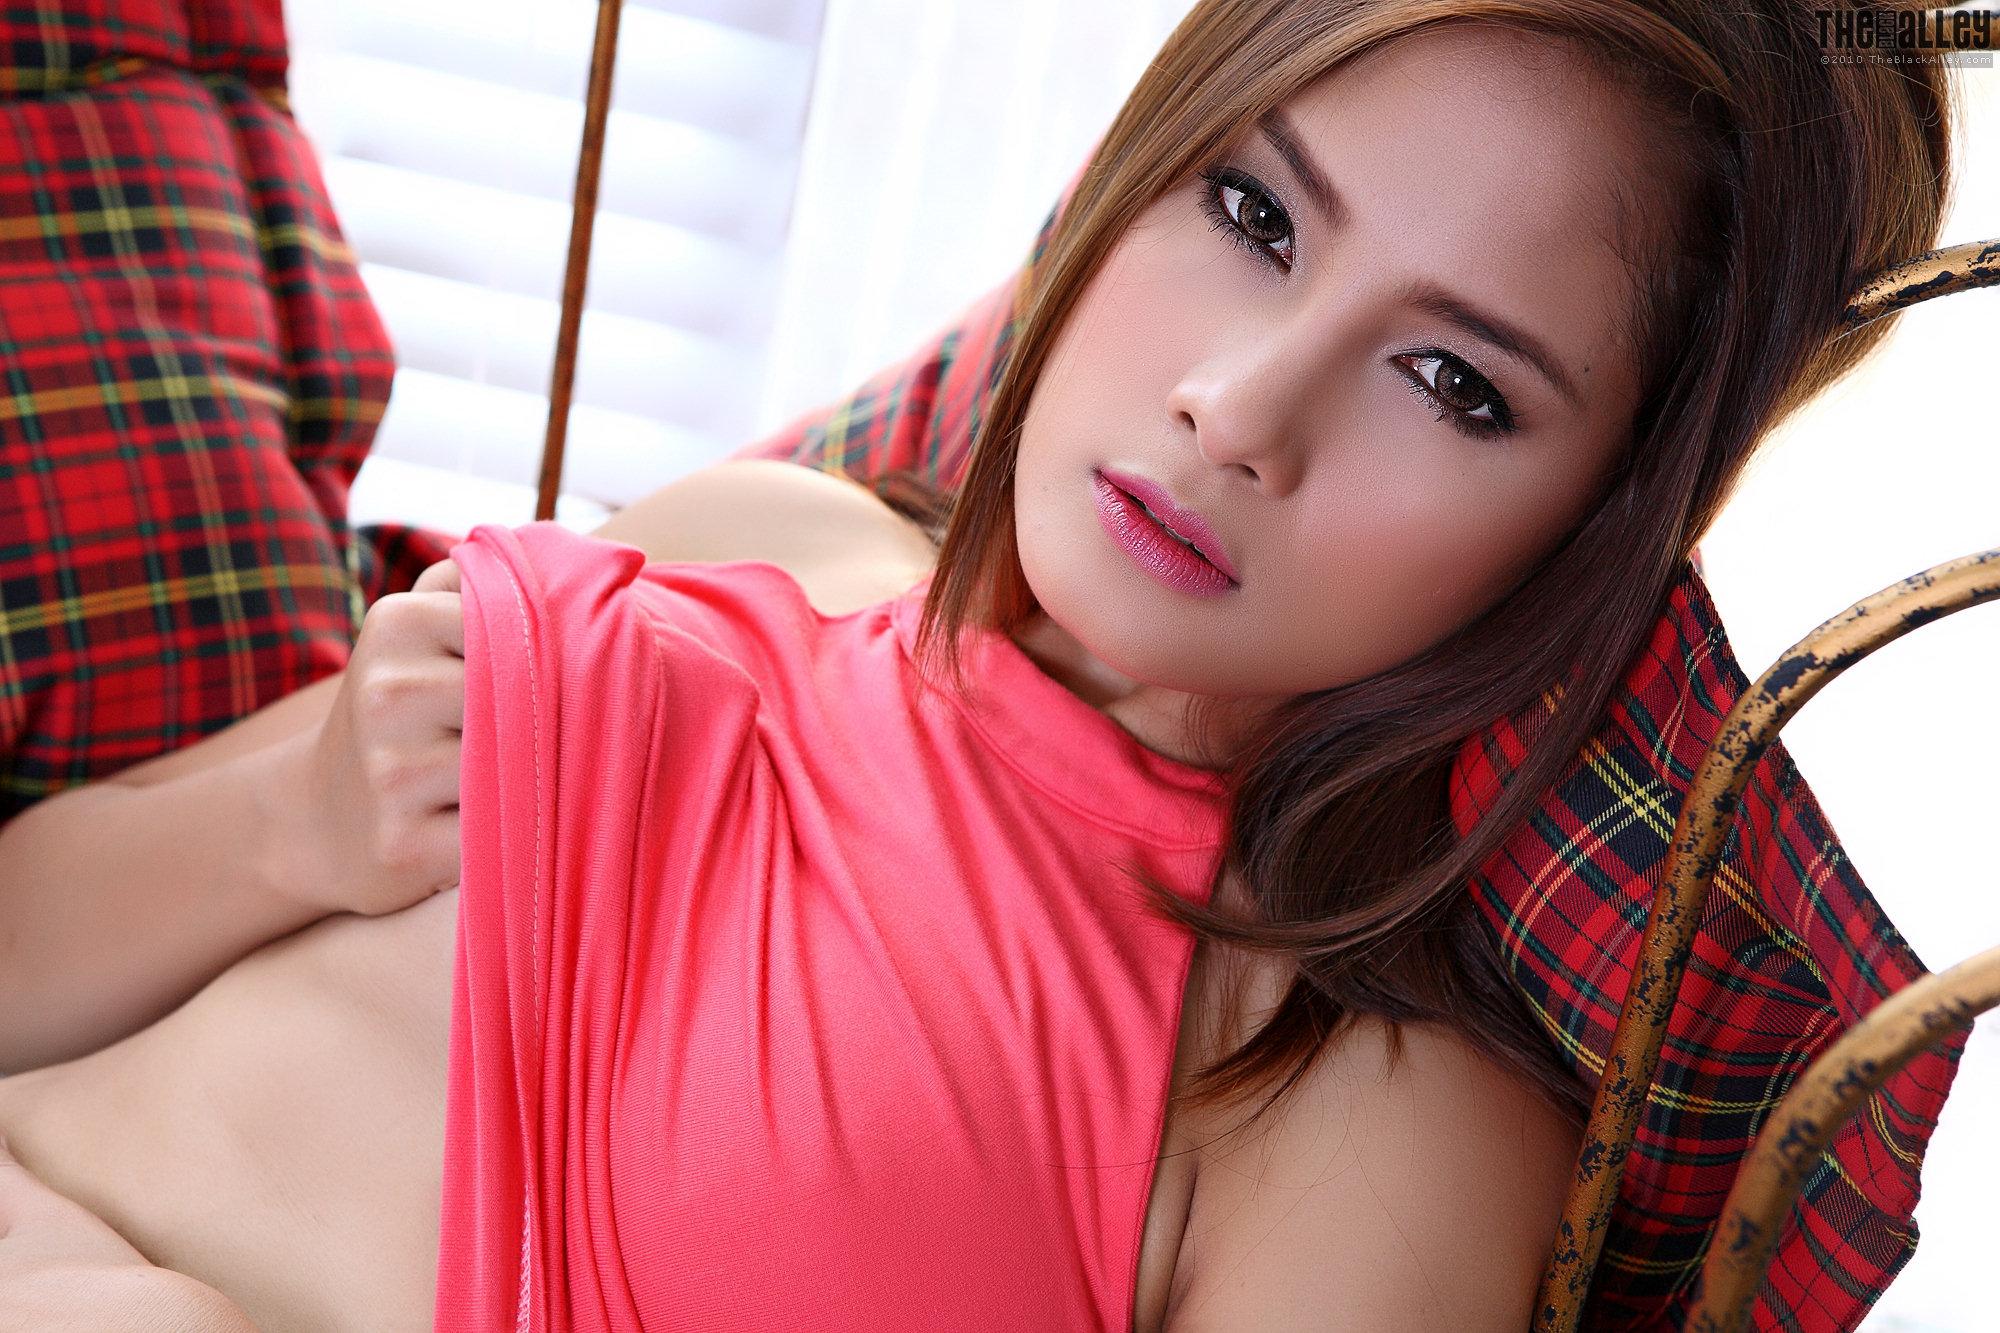 litu 100 archives: Winny Sung set 28